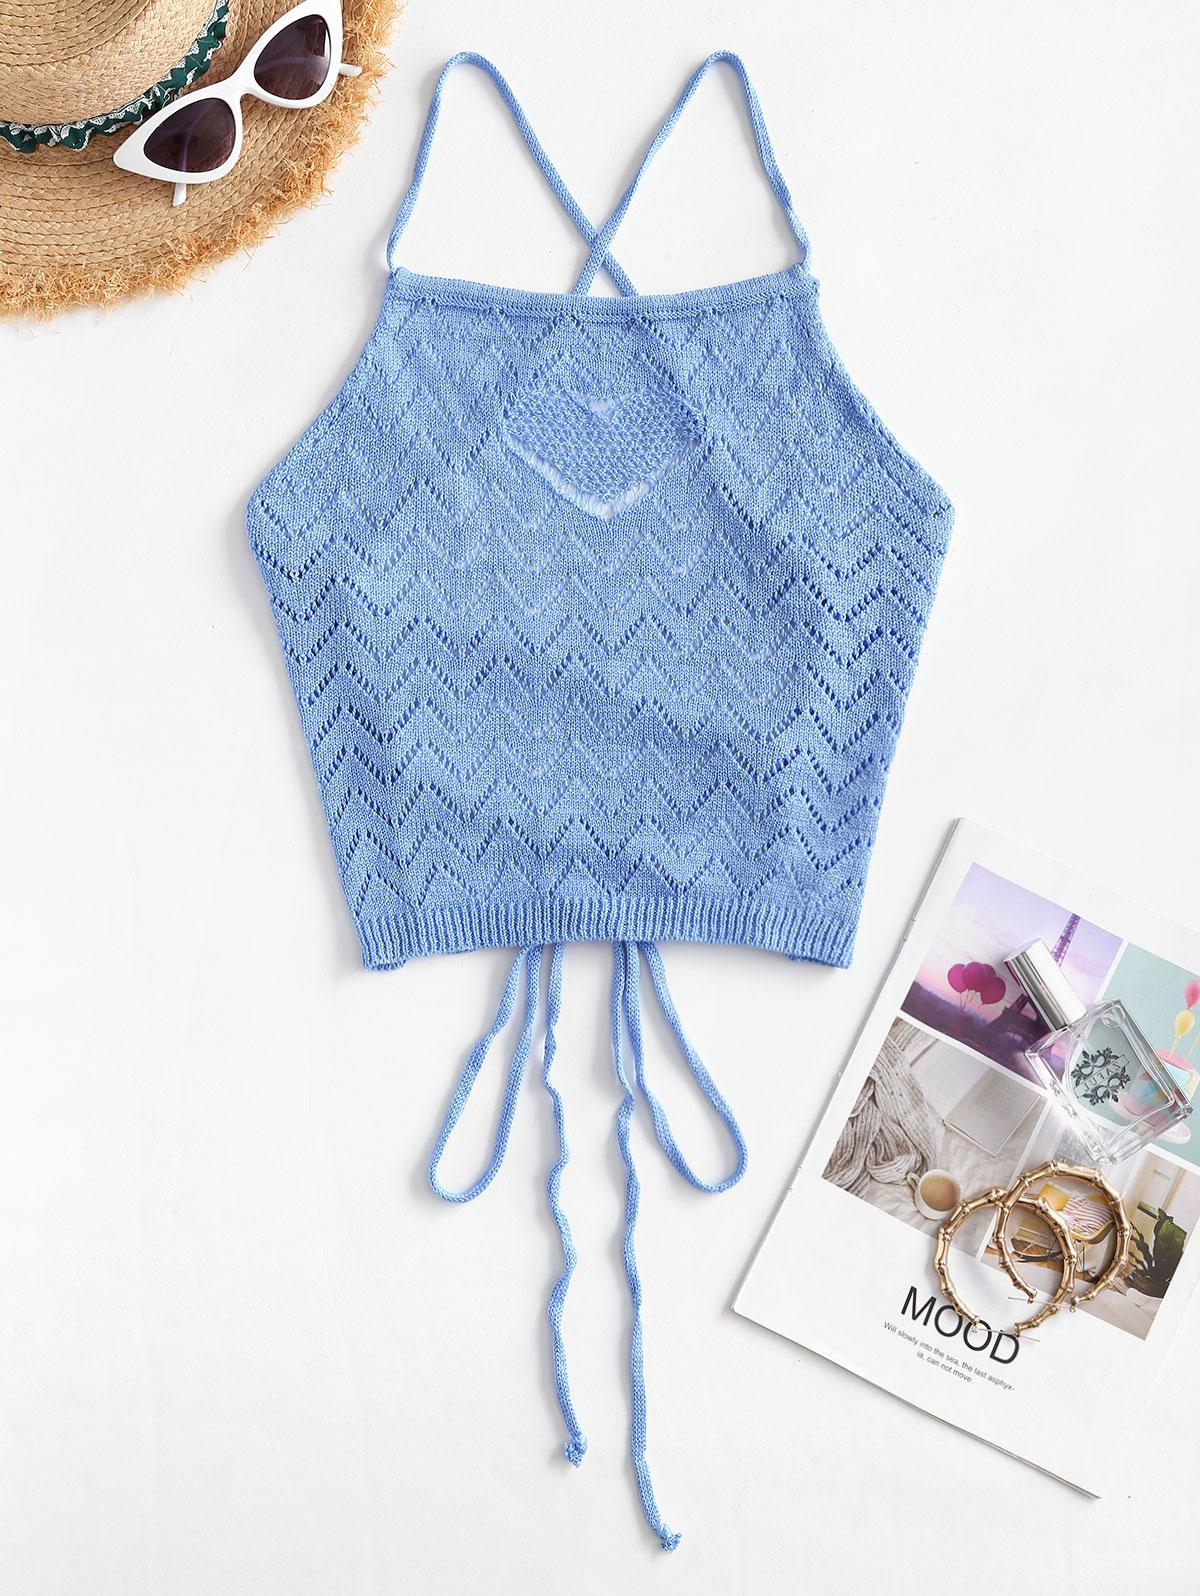 Zig Zag Pointelle Knit Lace Up Top